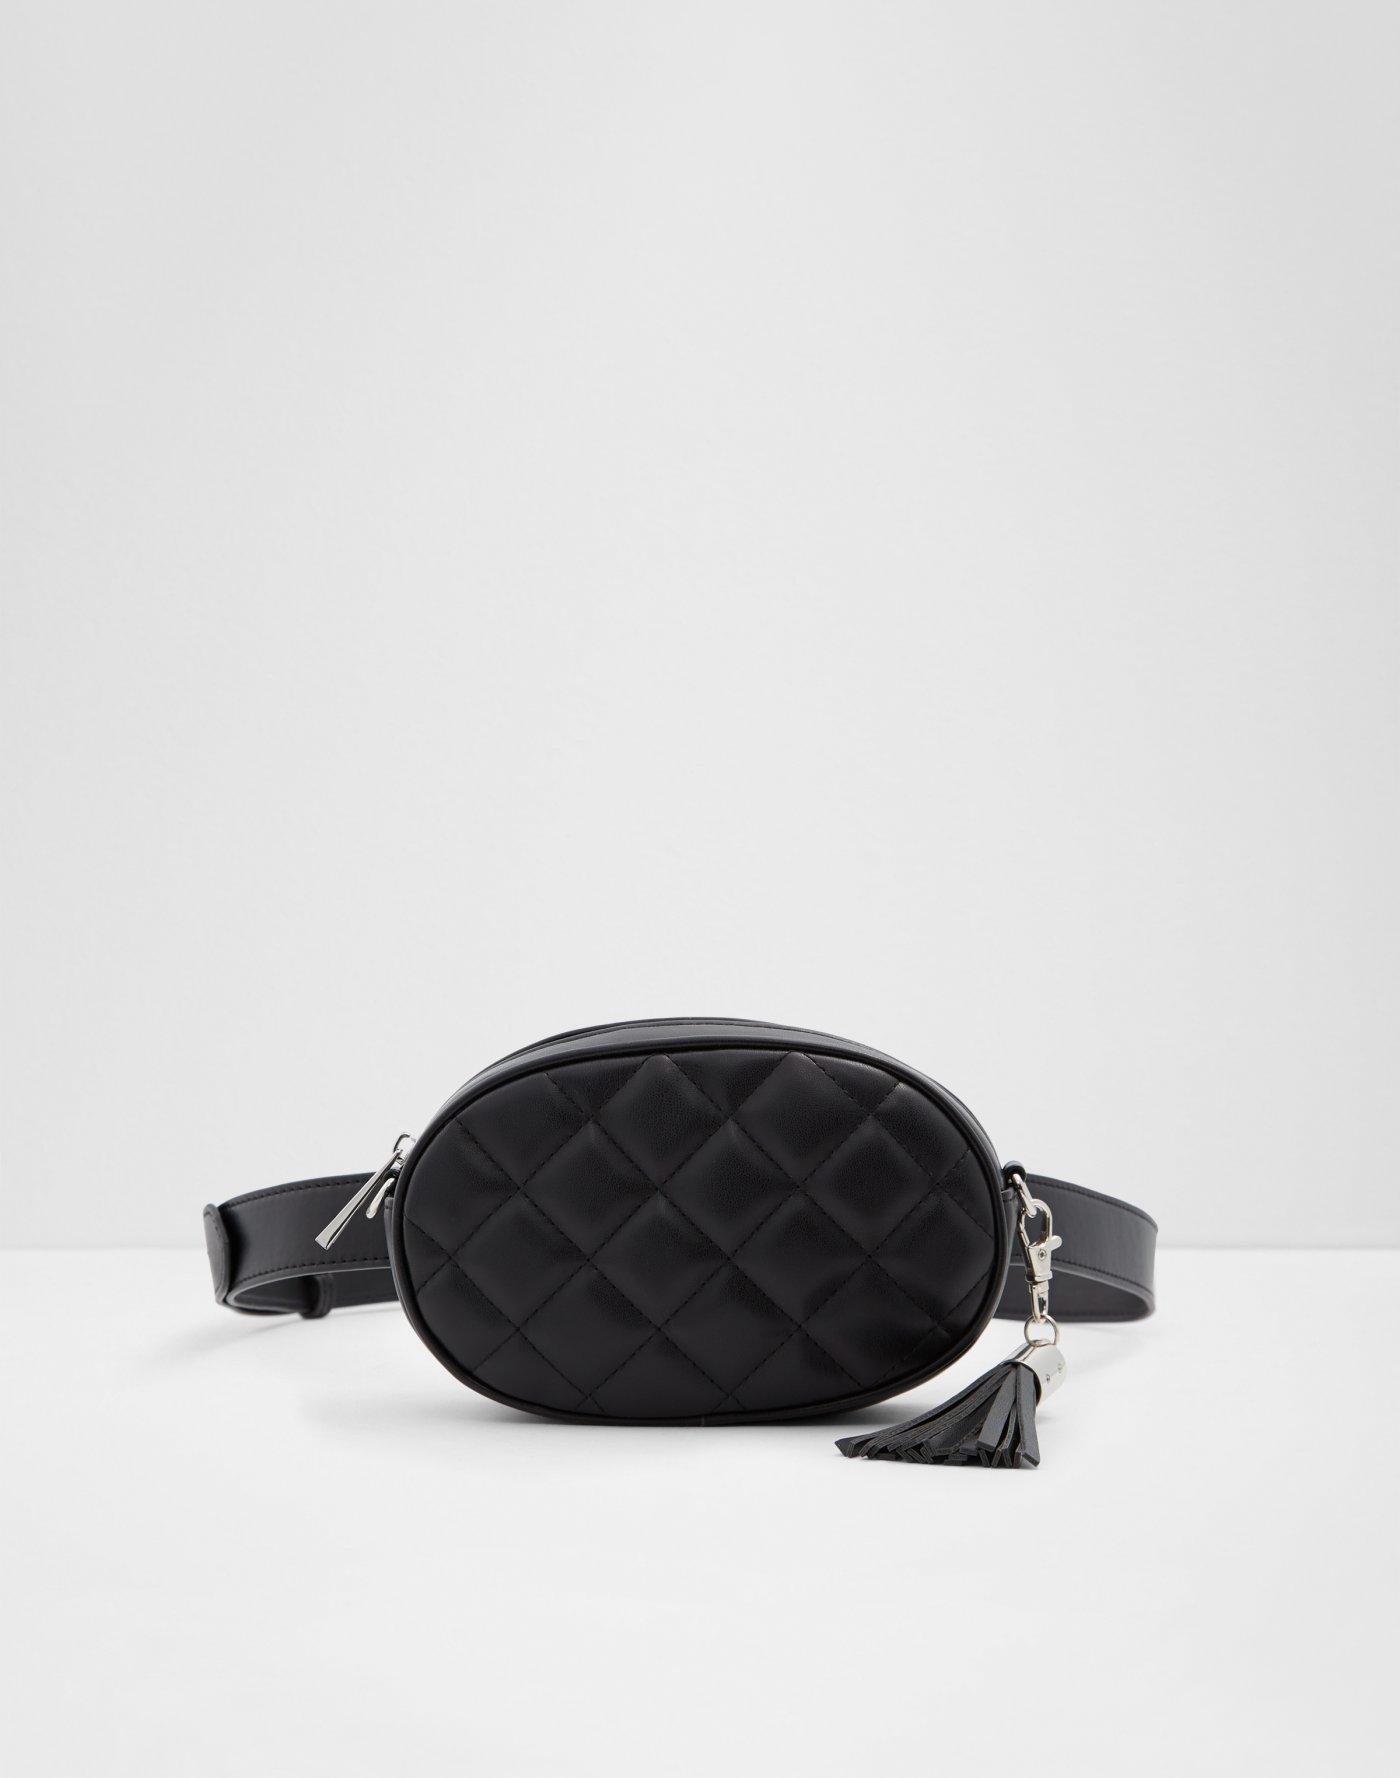 ba51246a3f4 Handbags | Aldoshoes.com US